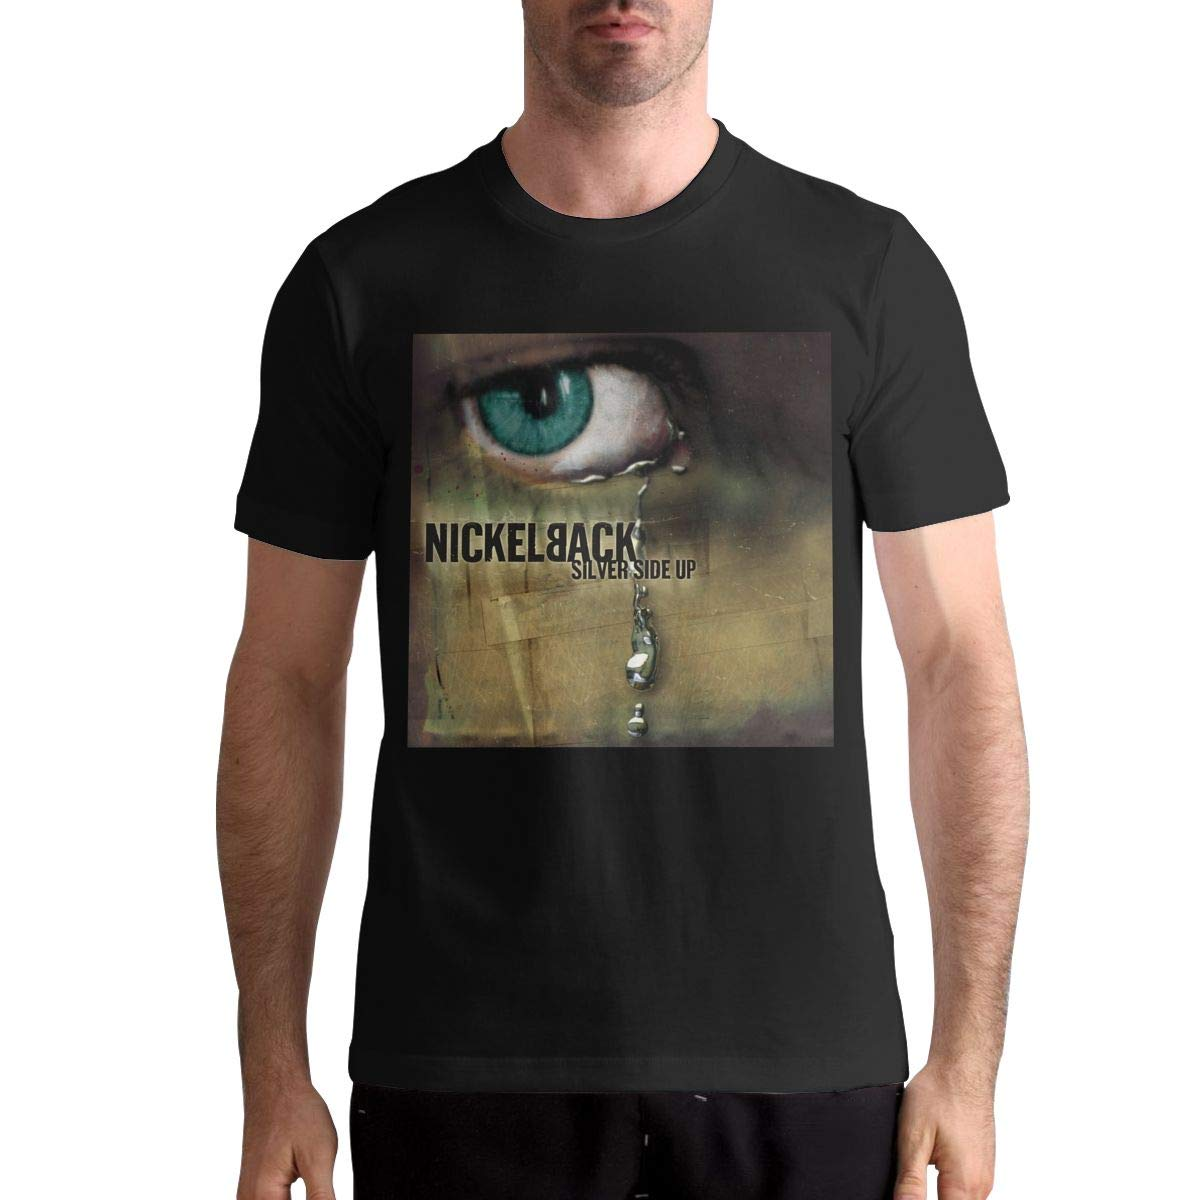 Hazeltdahl Nickelback Casual S Short Sleeve Pattern Tee Black Shirts